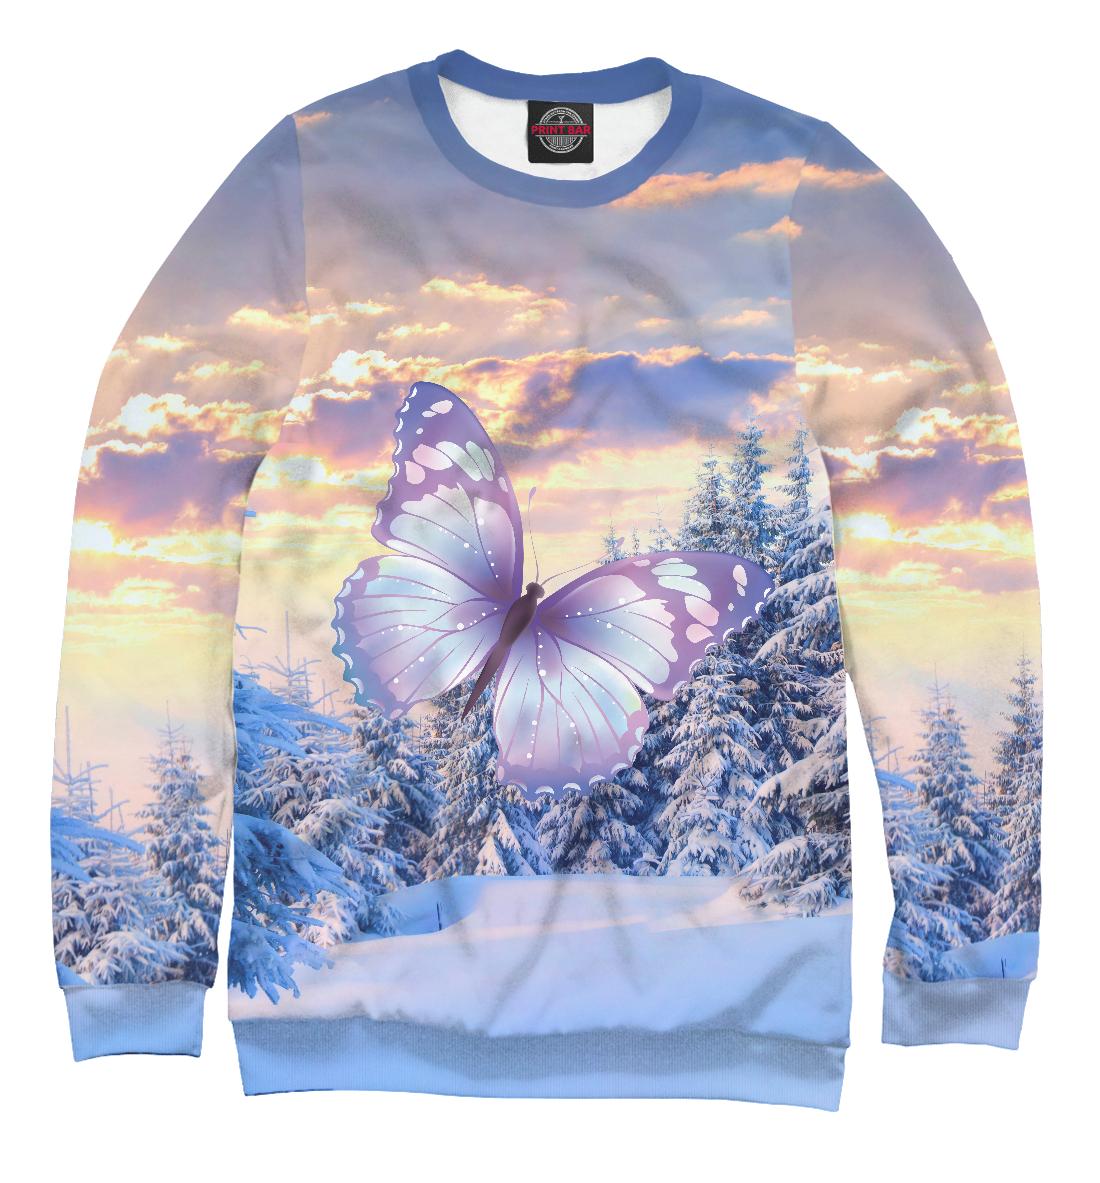 Купить Зимняя бабочка, Printbar, Свитшоты, NAS-368952-swi-2